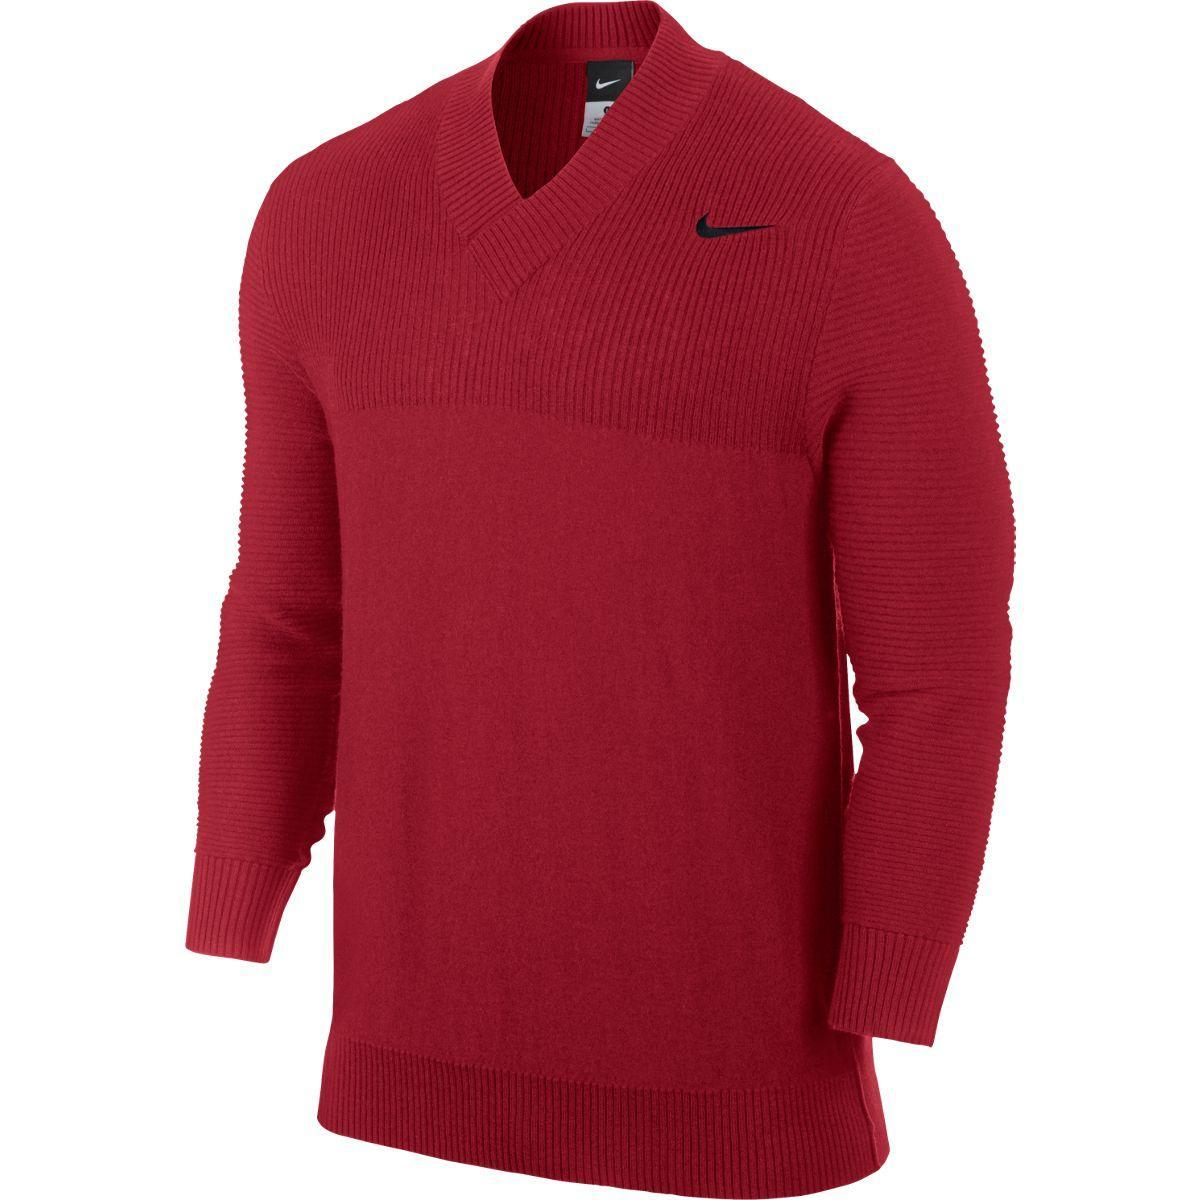 685594be1 Nike Mens V-Neck Sweater - Red/Black - Tennisnuts.com